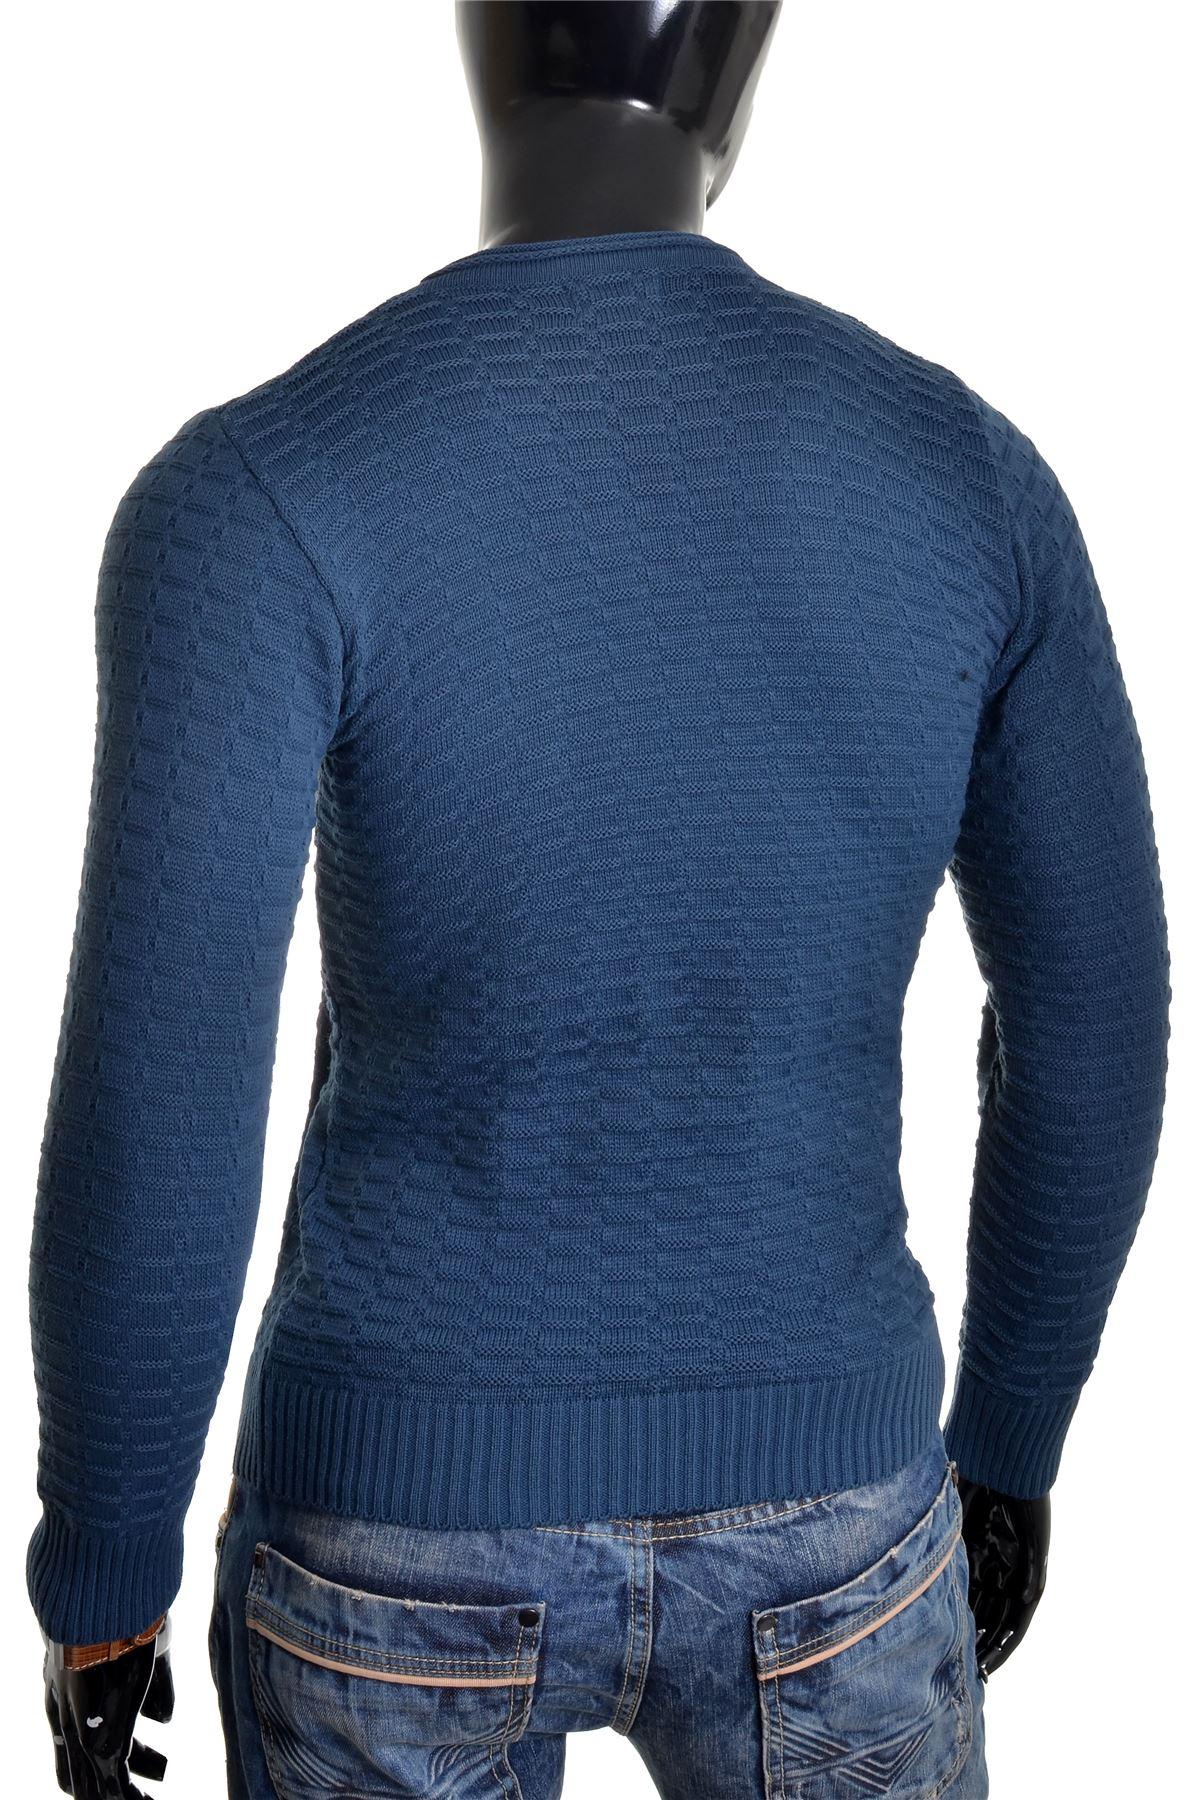 Men-039-s-Jumper-Striped-Knit-Smart-Long-Sleeve-Sweater-Crew-Neck-Top-Slim-Fitness thumbnail 21